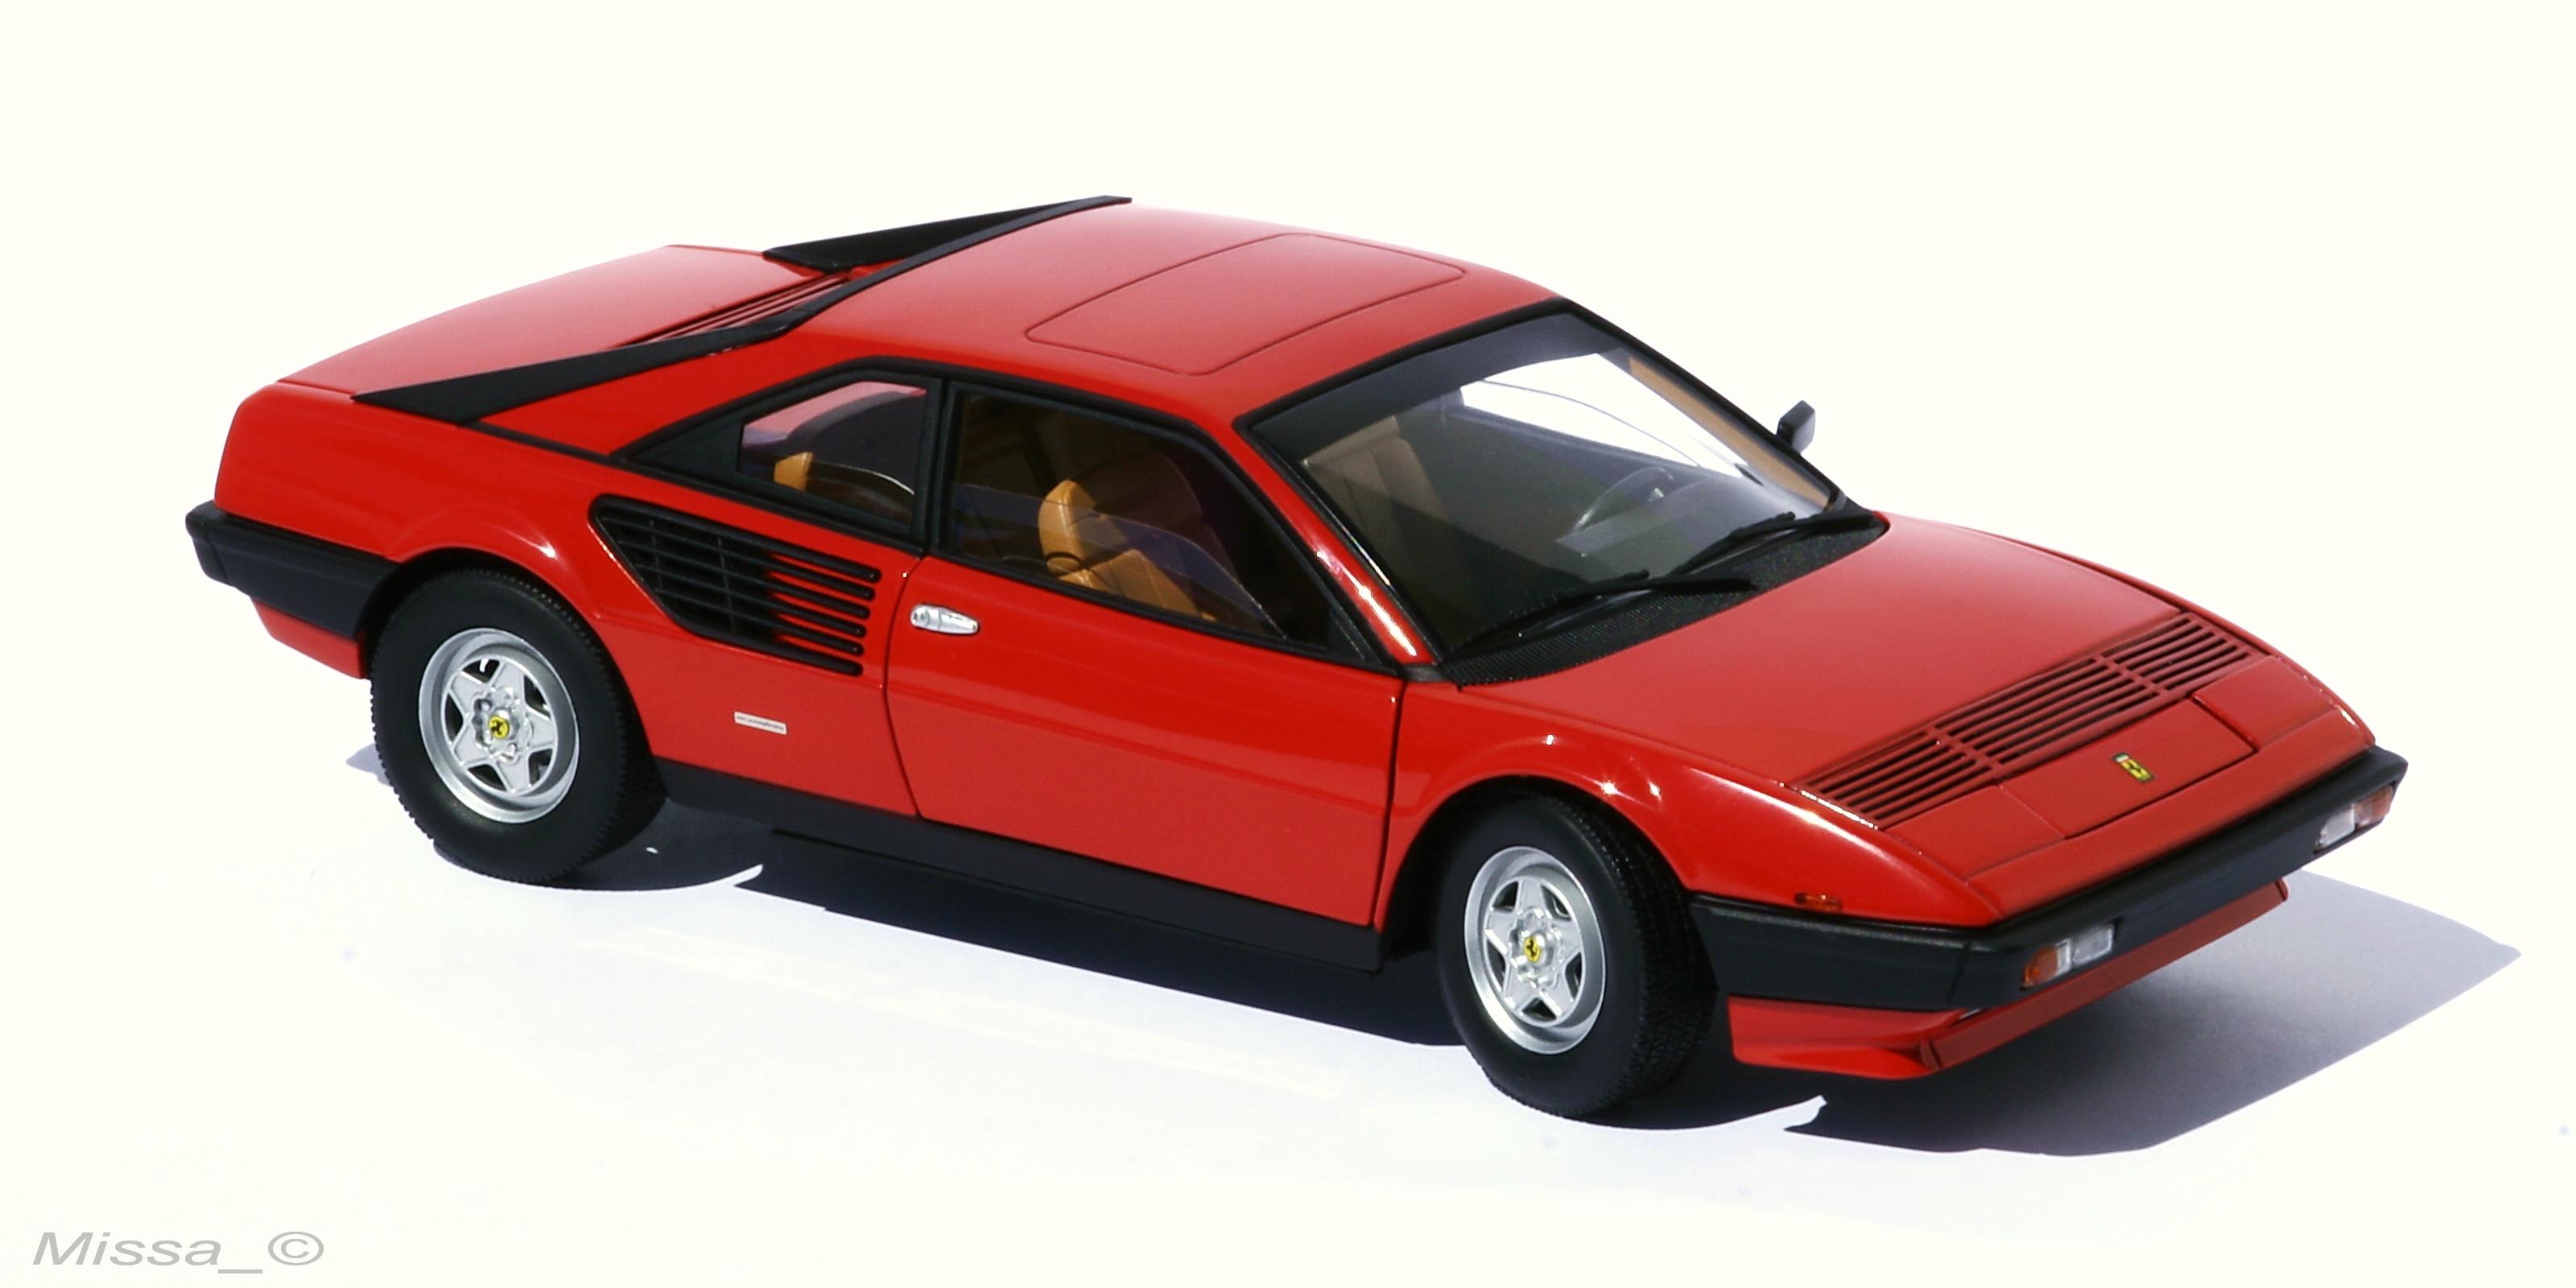 015_elite_ferrari_mondmb9q Fabulous Ferrari Mondial 8 Super Elite Cars Trend